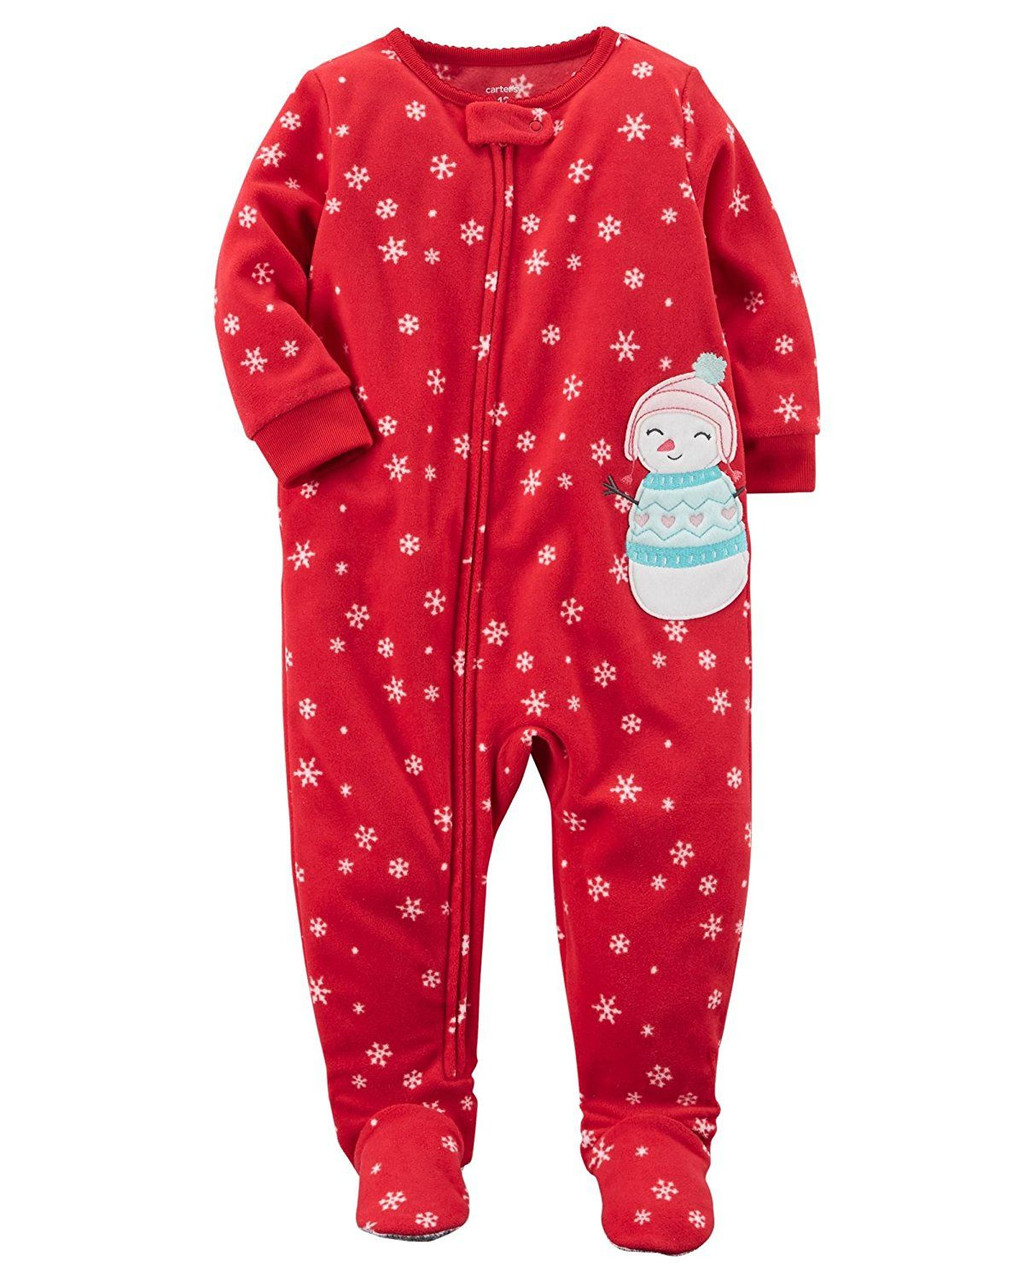 Reindeer Fleece Footed Pajama Sleeper 5T Snowman Carter/'s Christmas Tree